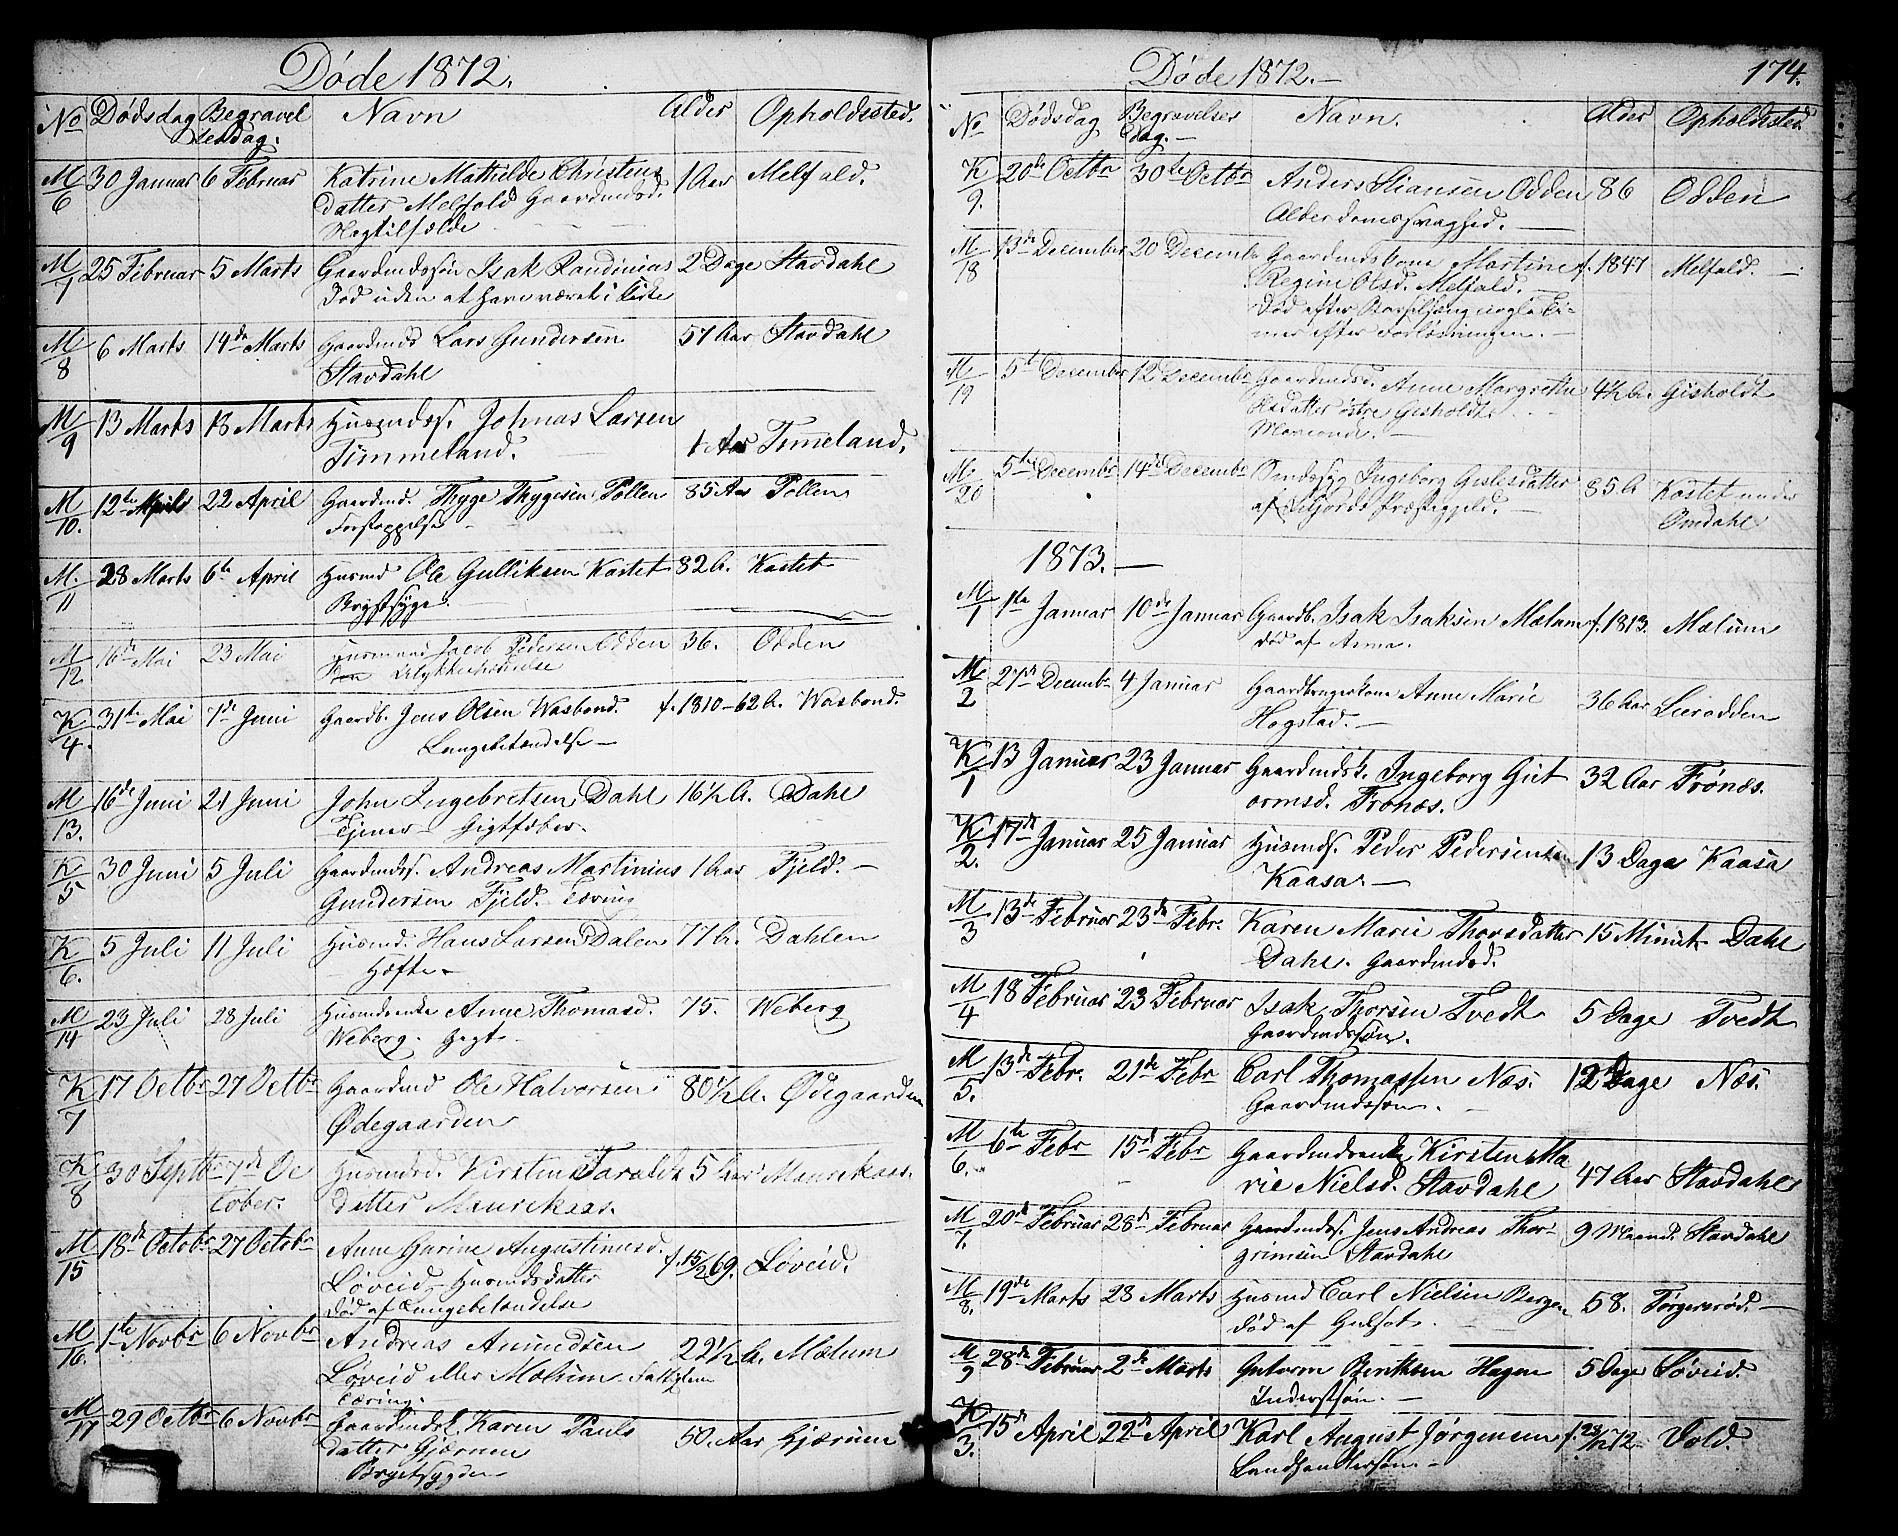 SAKO, Solum kirkebøker, G/Gb/L0002: Klokkerbok nr. II 2, 1859-1879, s. 174